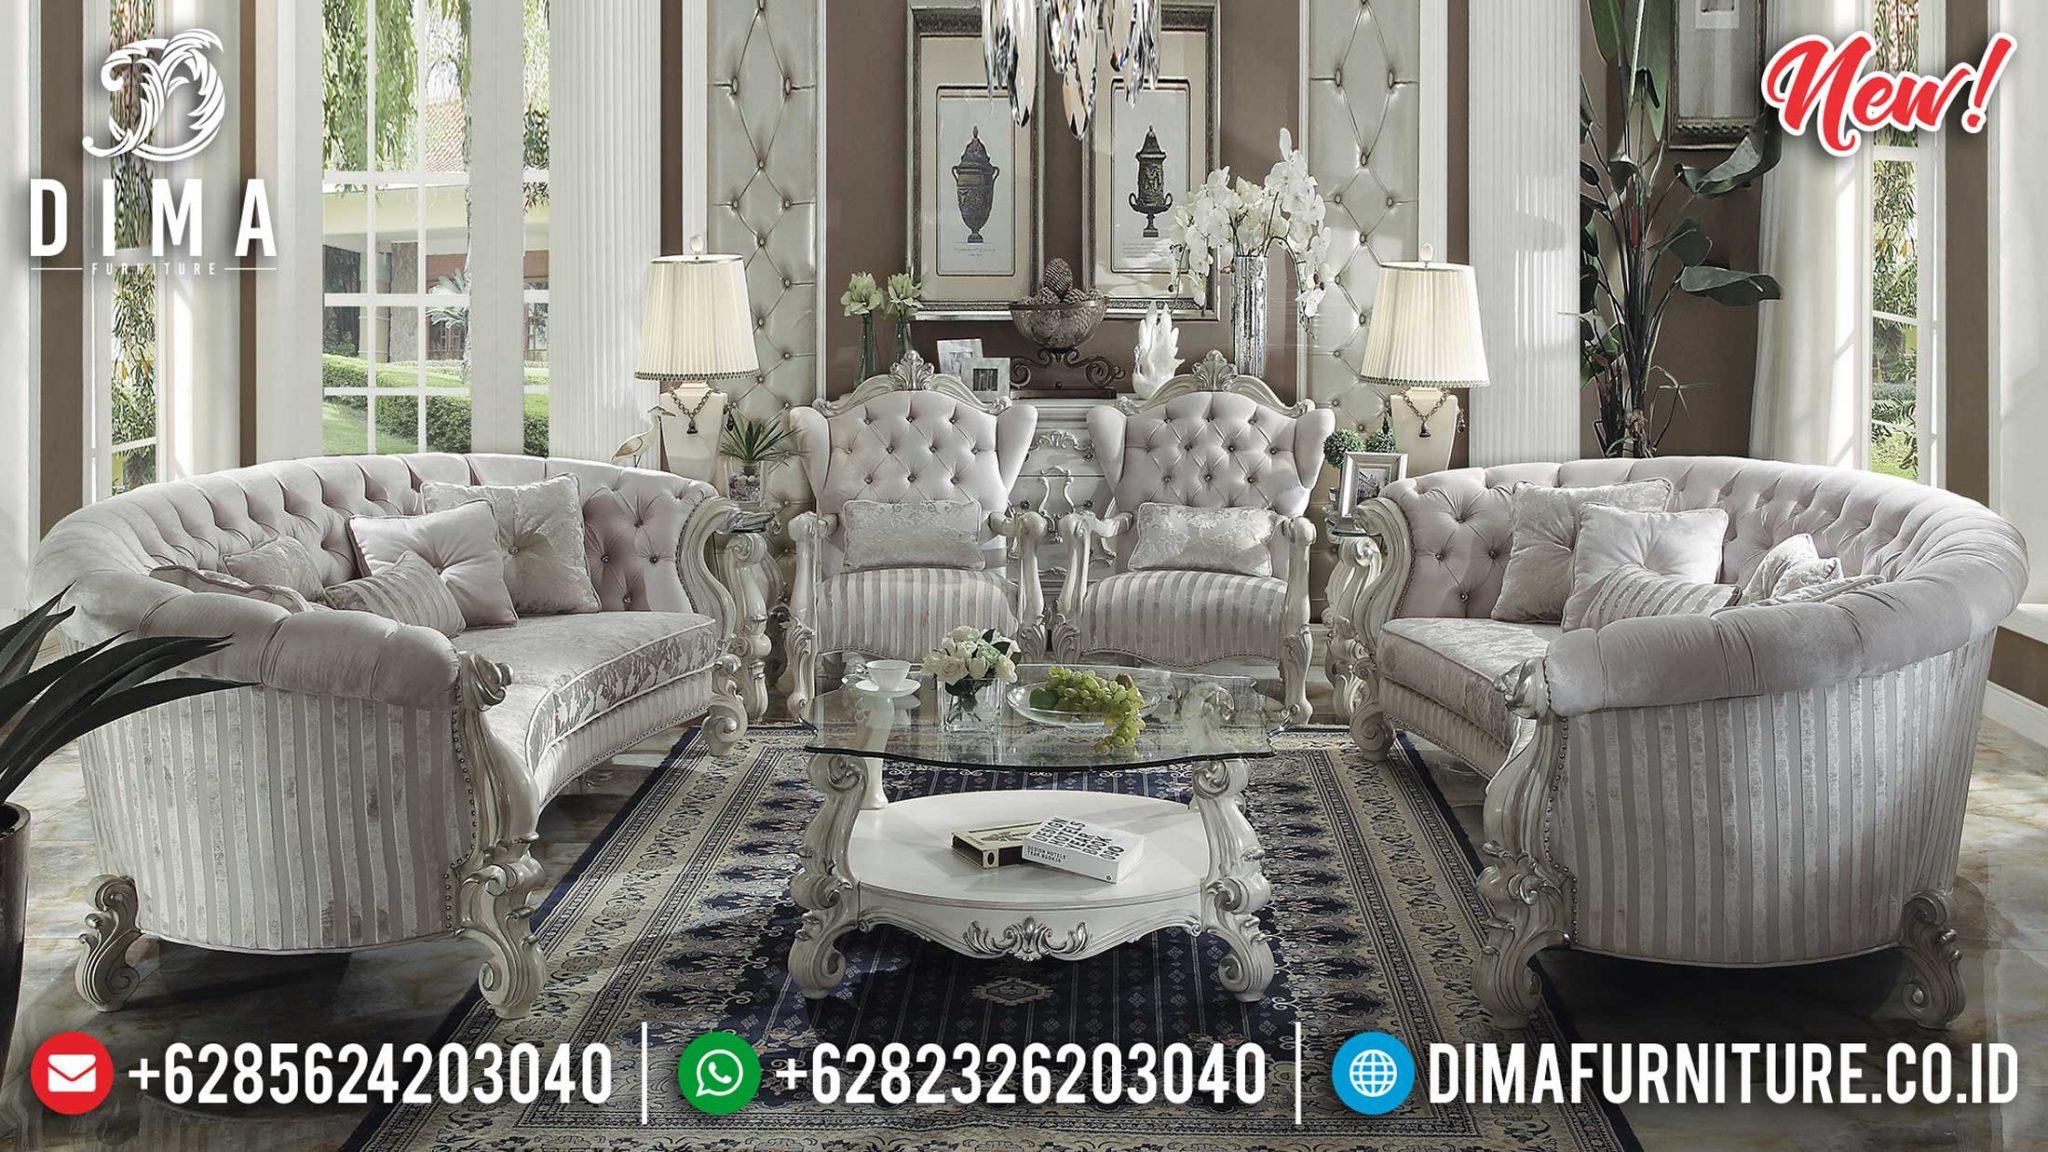 Harga Sofa Tamu Mewah Jepara Luxury Carving Soft Fabric Best Quality ST-1007